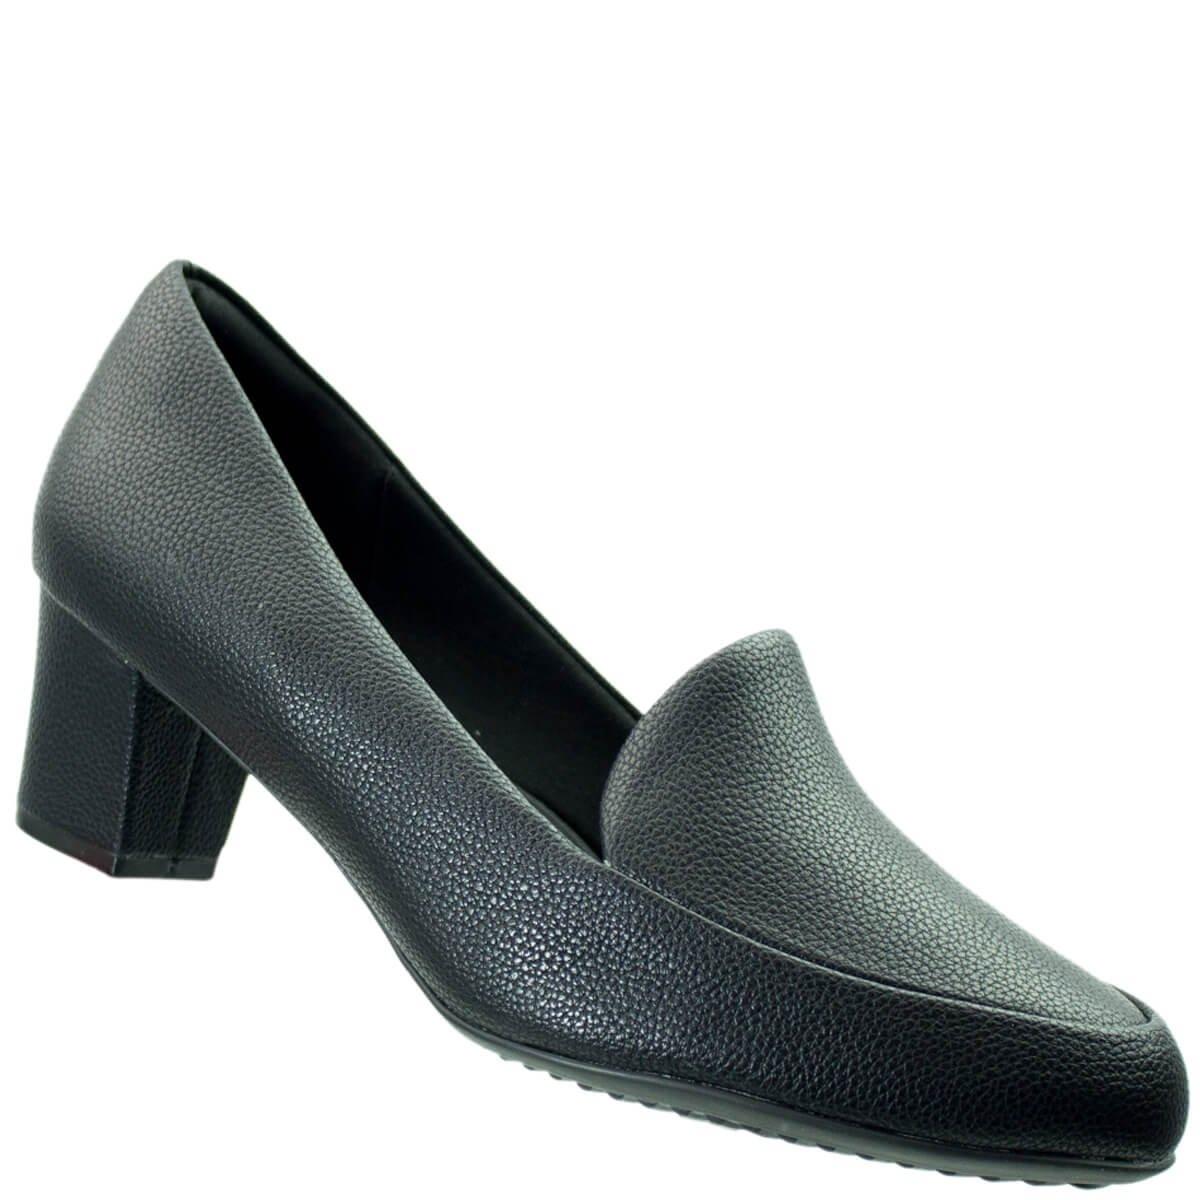 530c7ee814 Bizz Store - Sapato Feminino Piccadilly Slipper Salto Médio